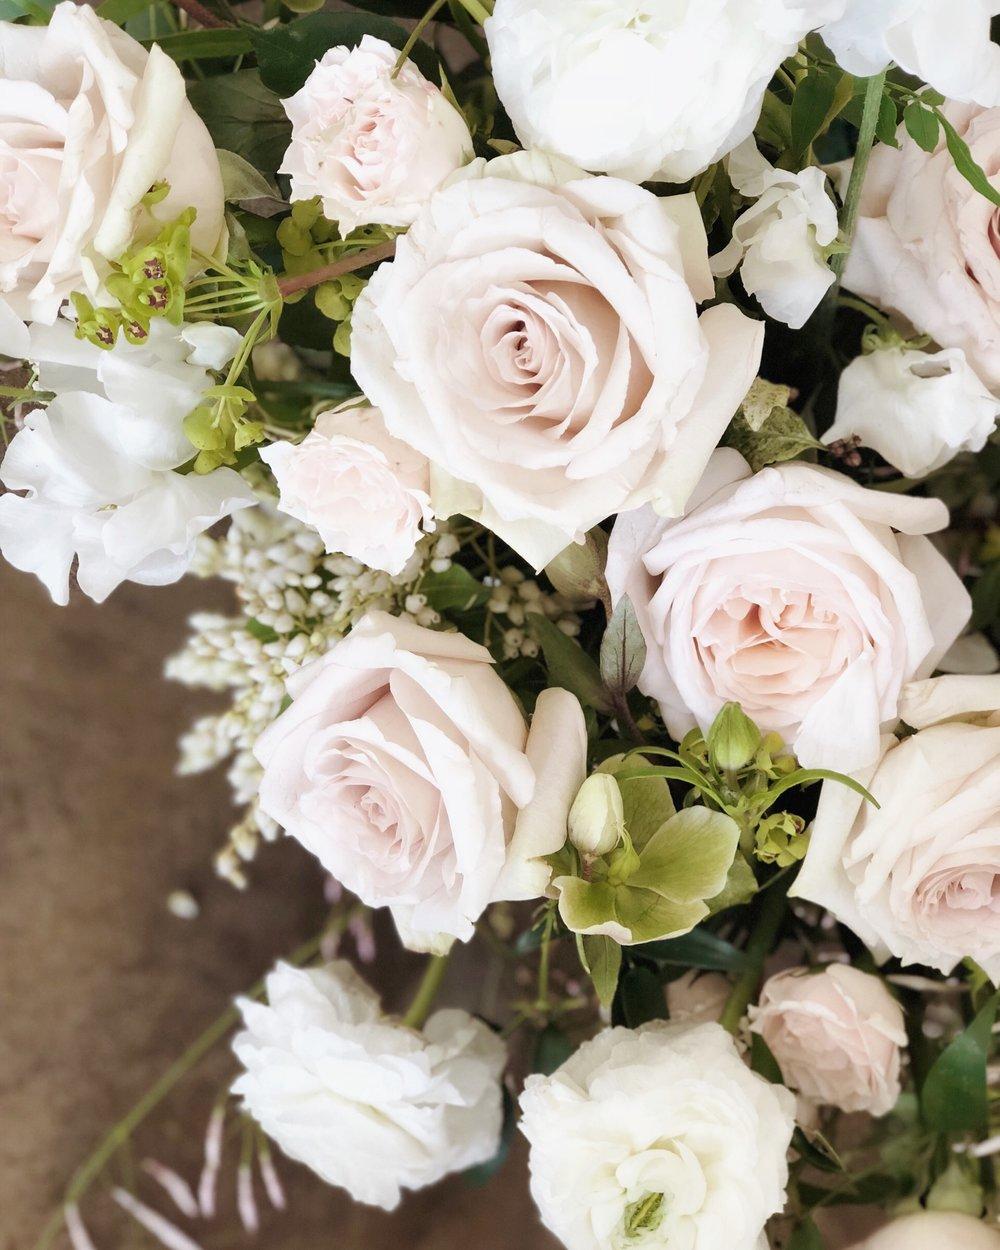 Floral Design | Instyle Blooms